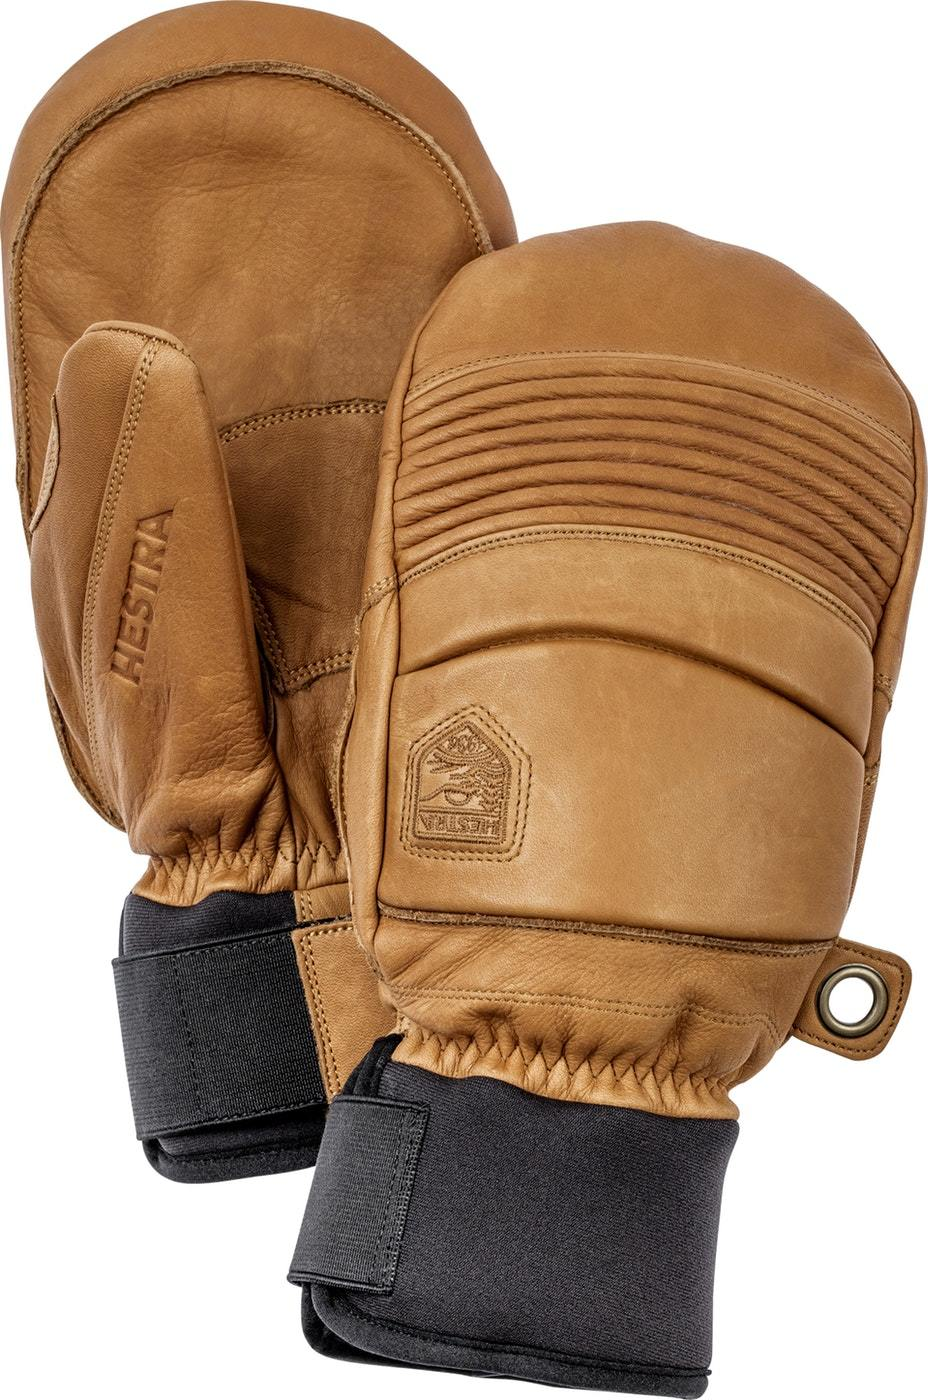 Leather Fall LIne Mitt - 31471-710